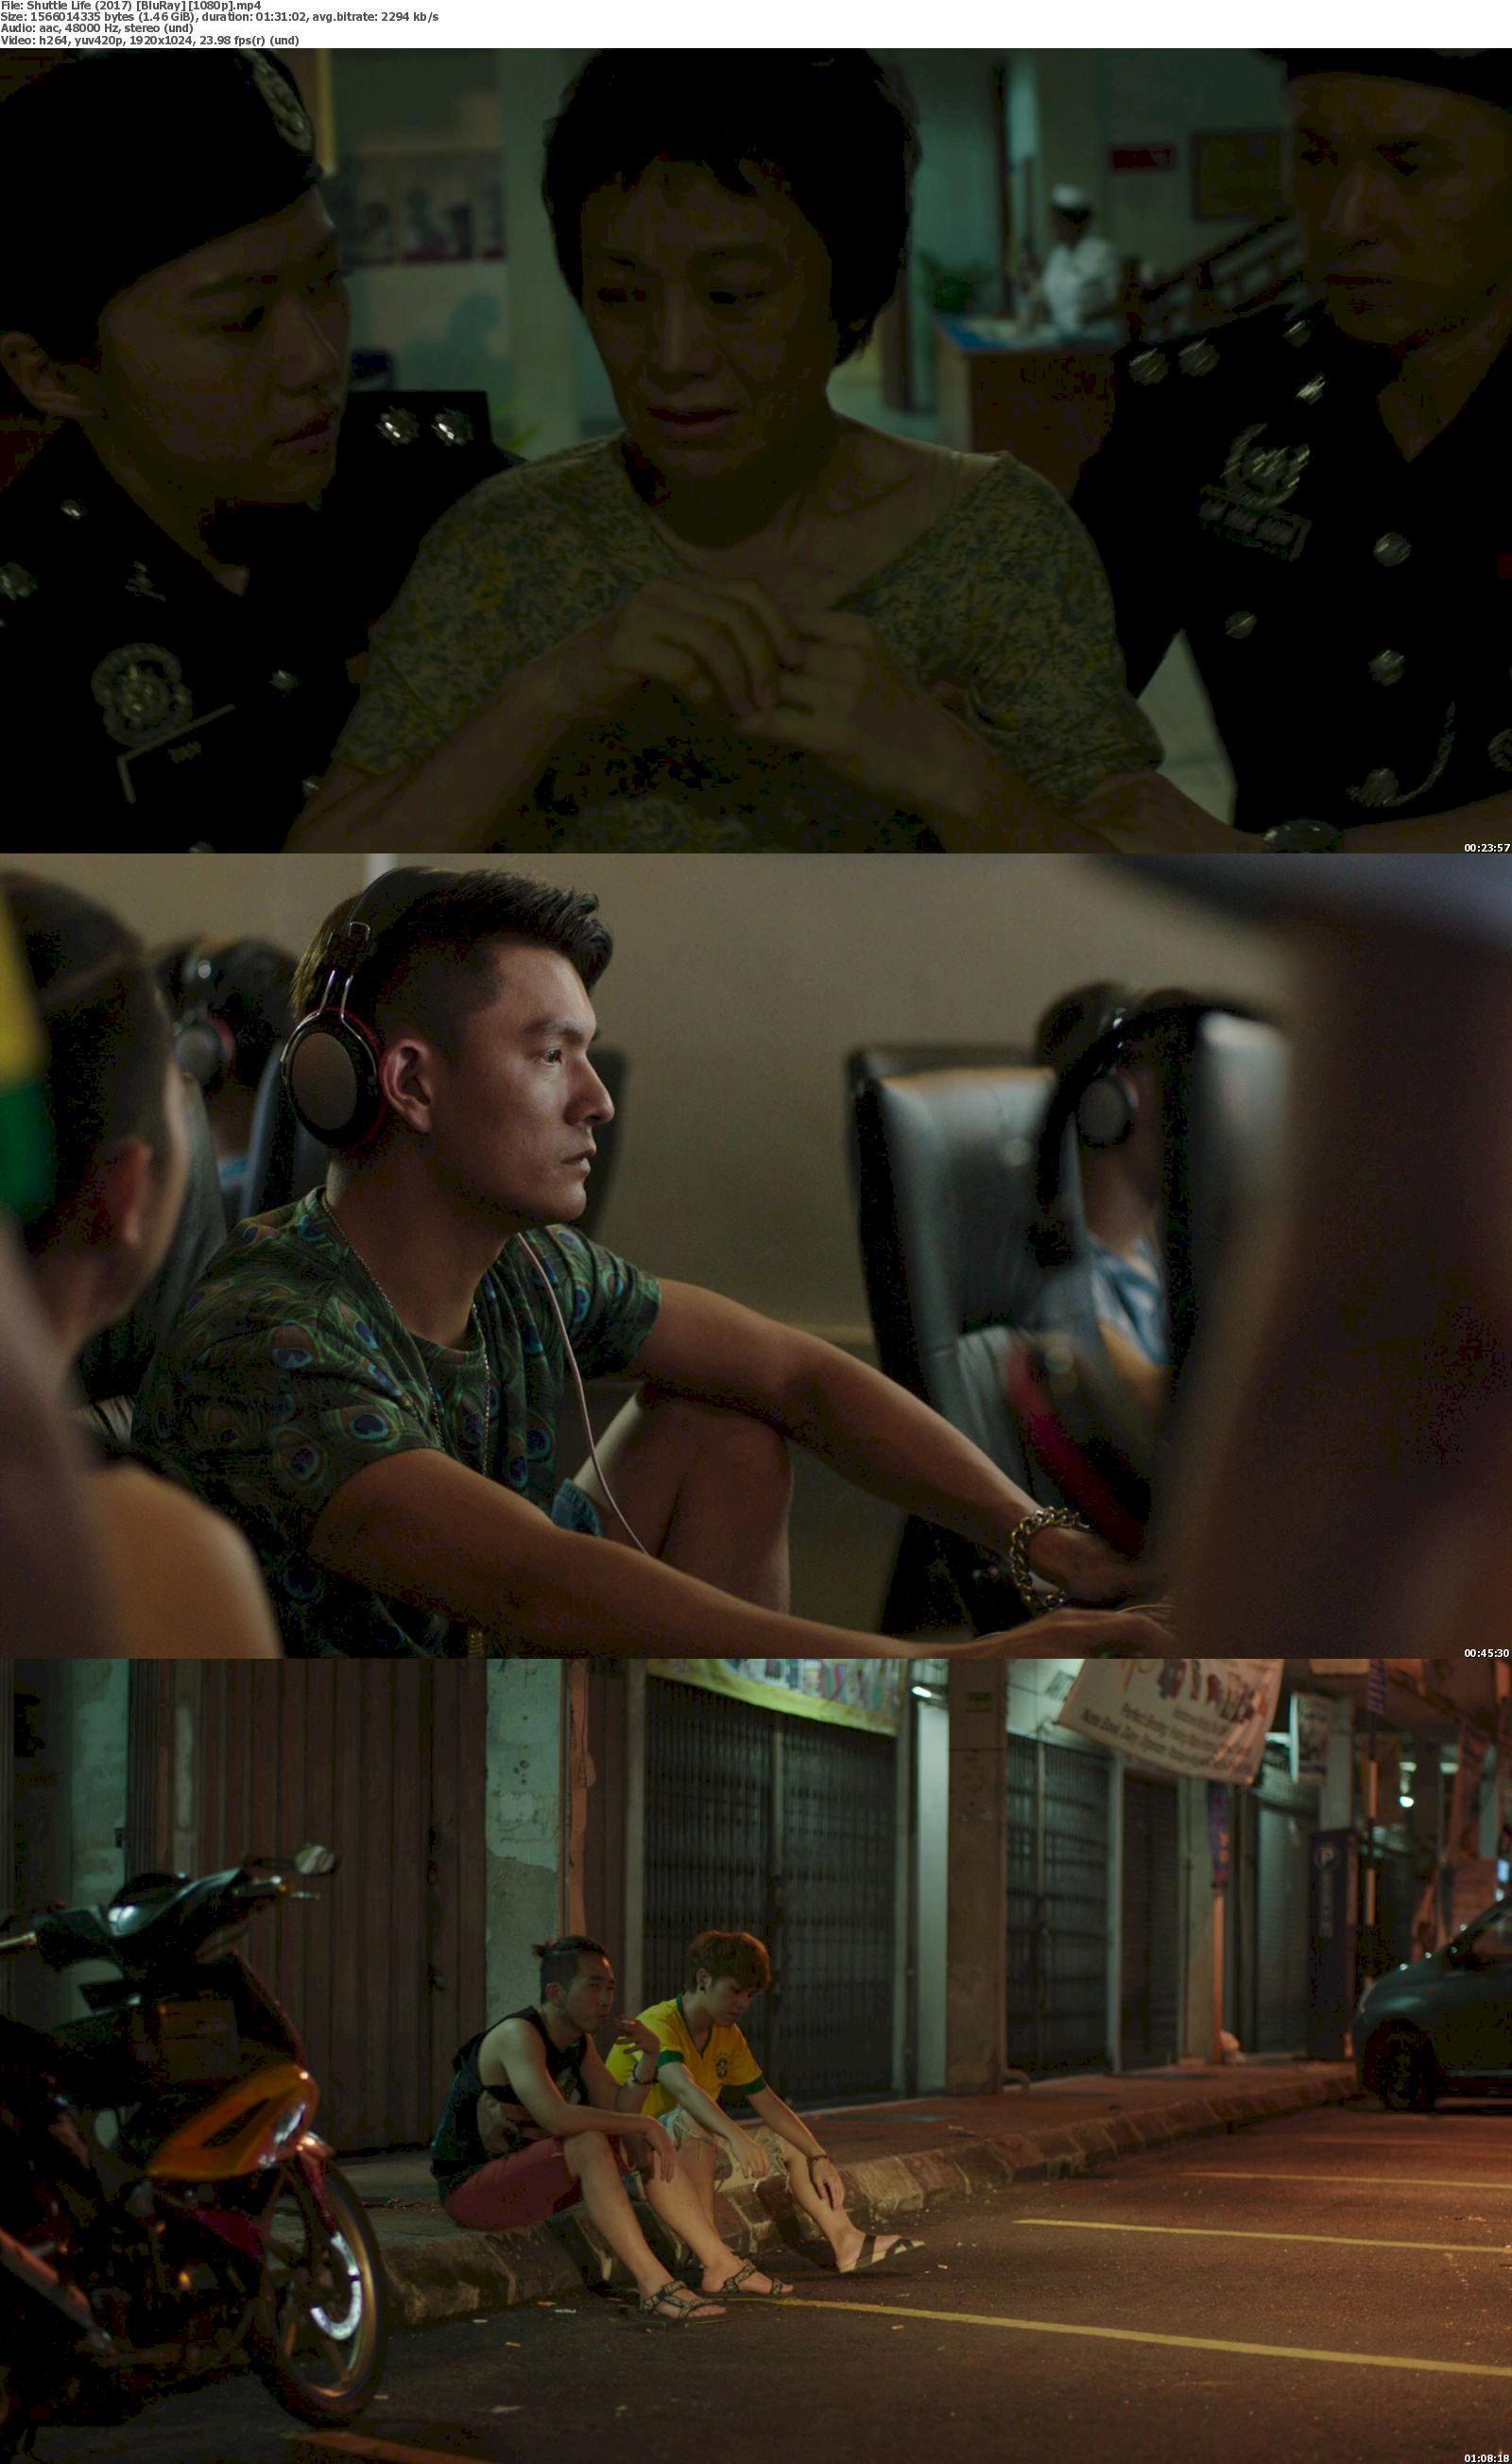 Shuttle Life (2017) [720p & 1080p] Bluray Free Download – Filmxy